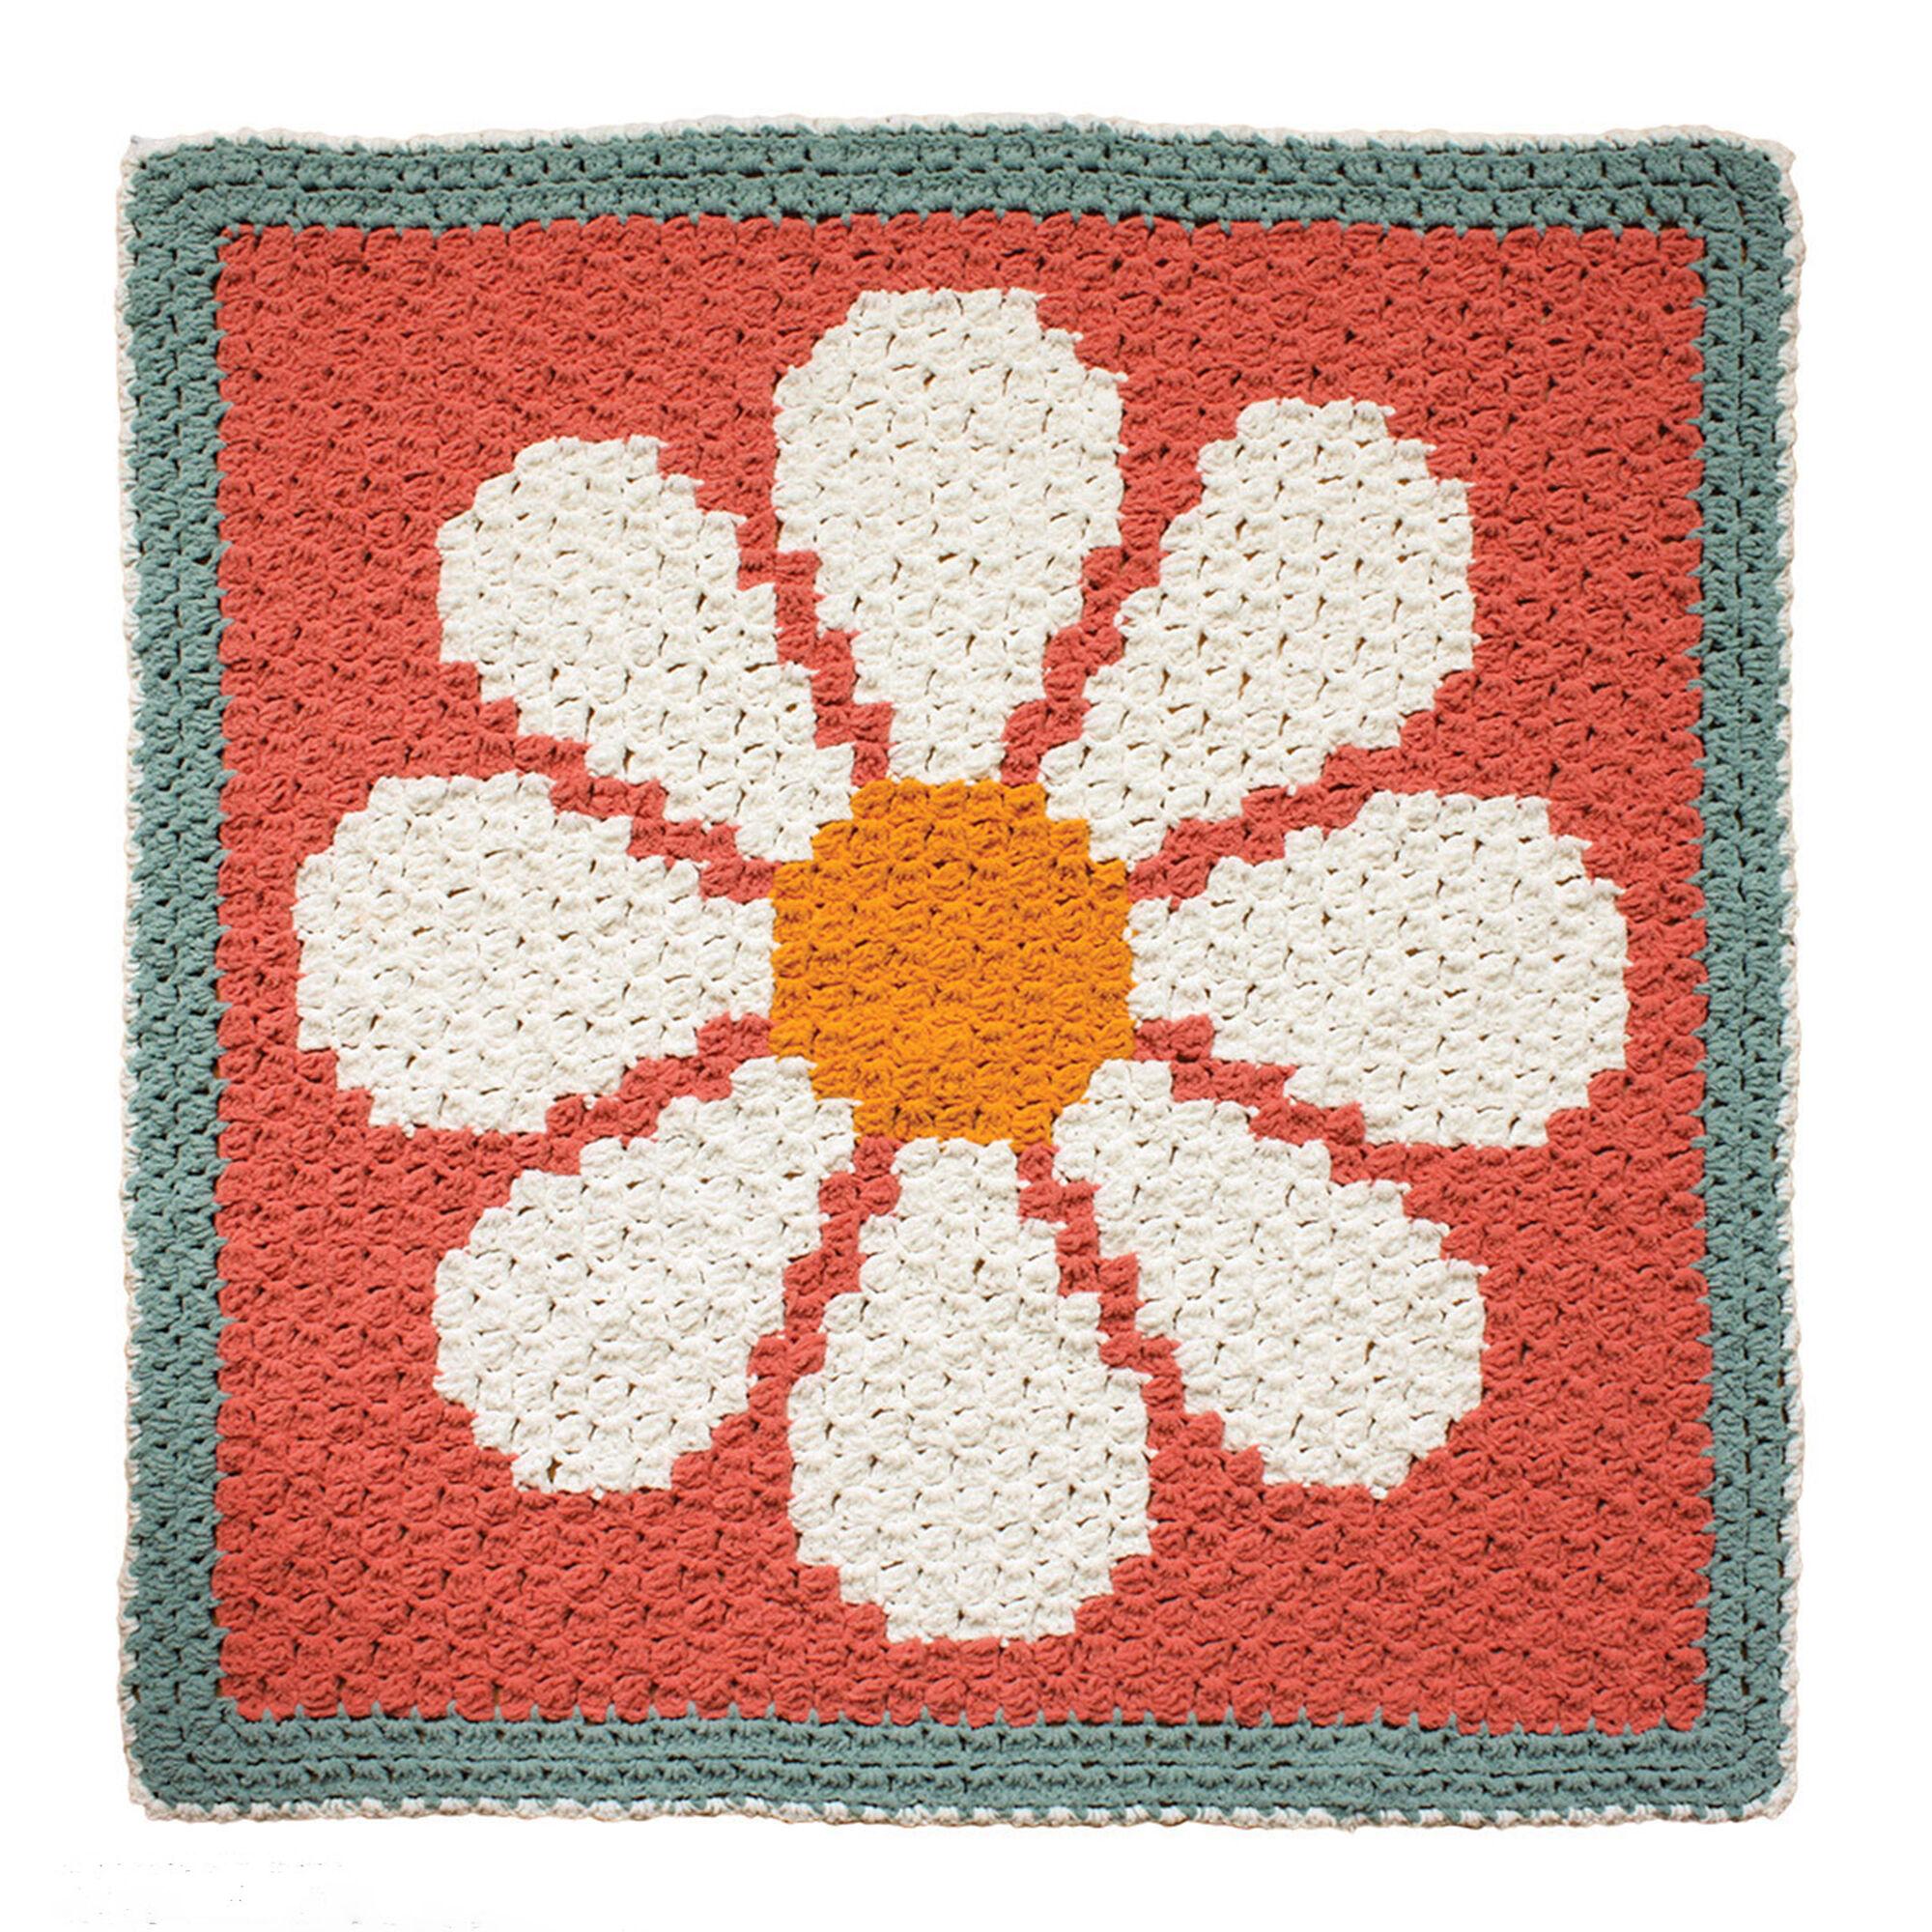 Bernat Daisy C2c Crochet Blanket Yarnspirations